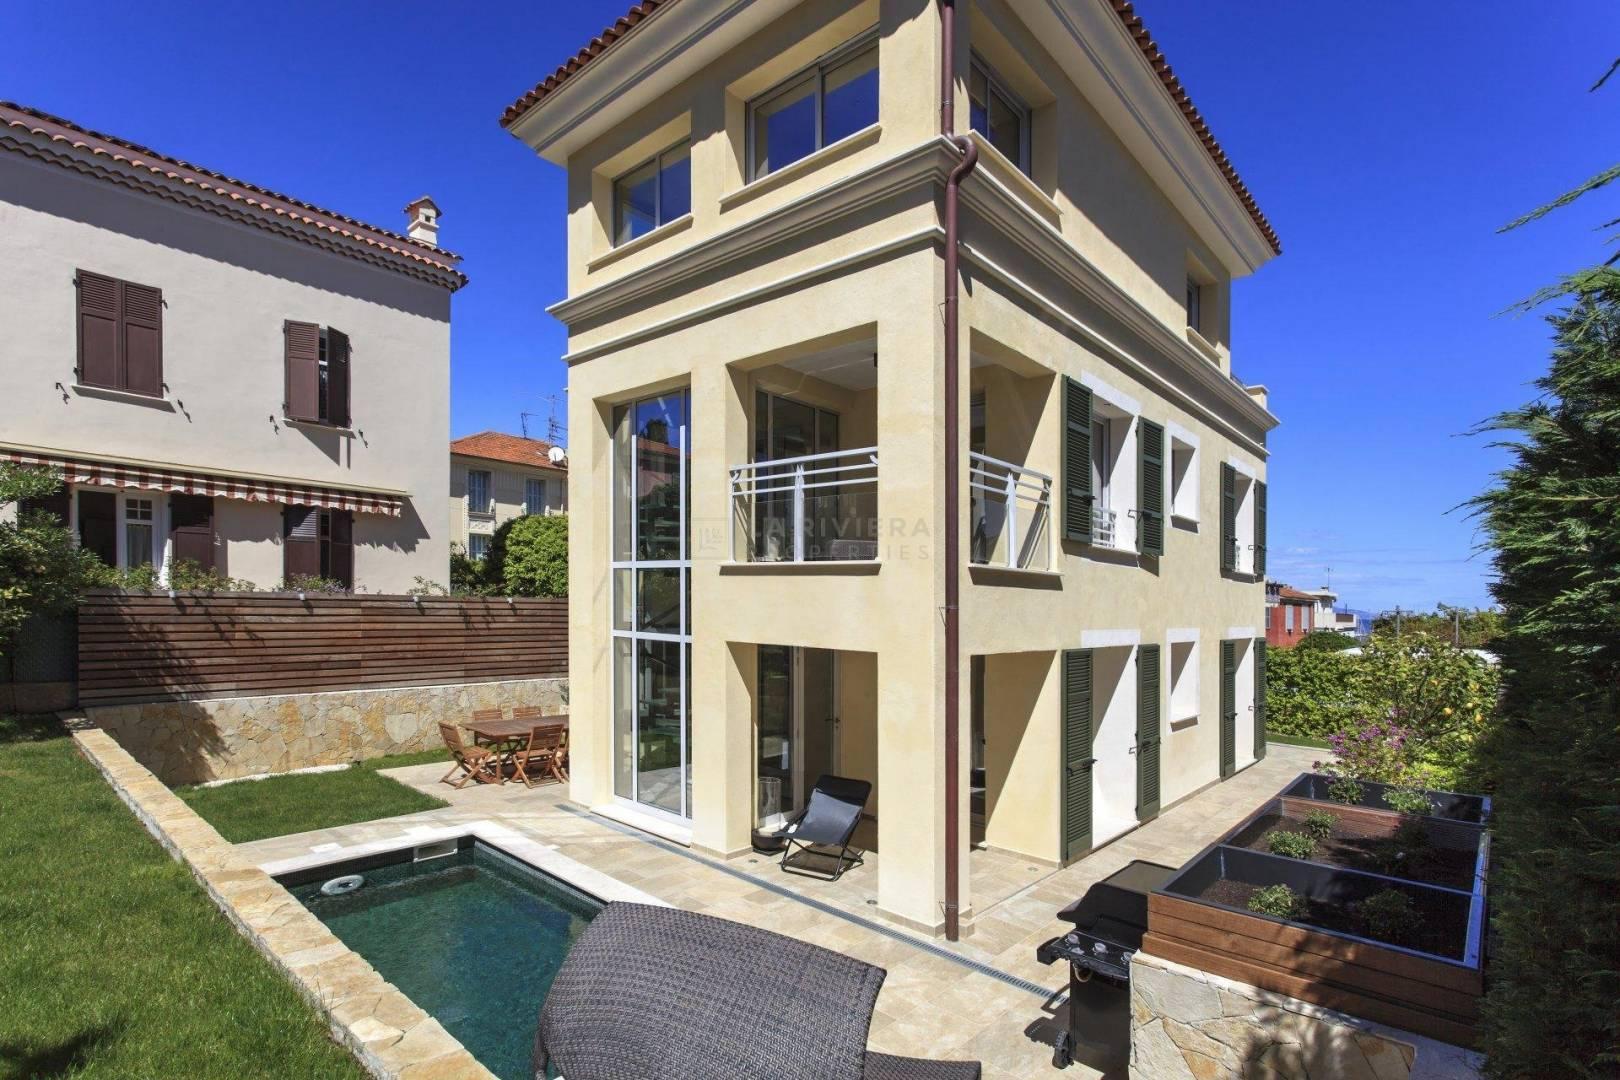 Garden and pool/terraces